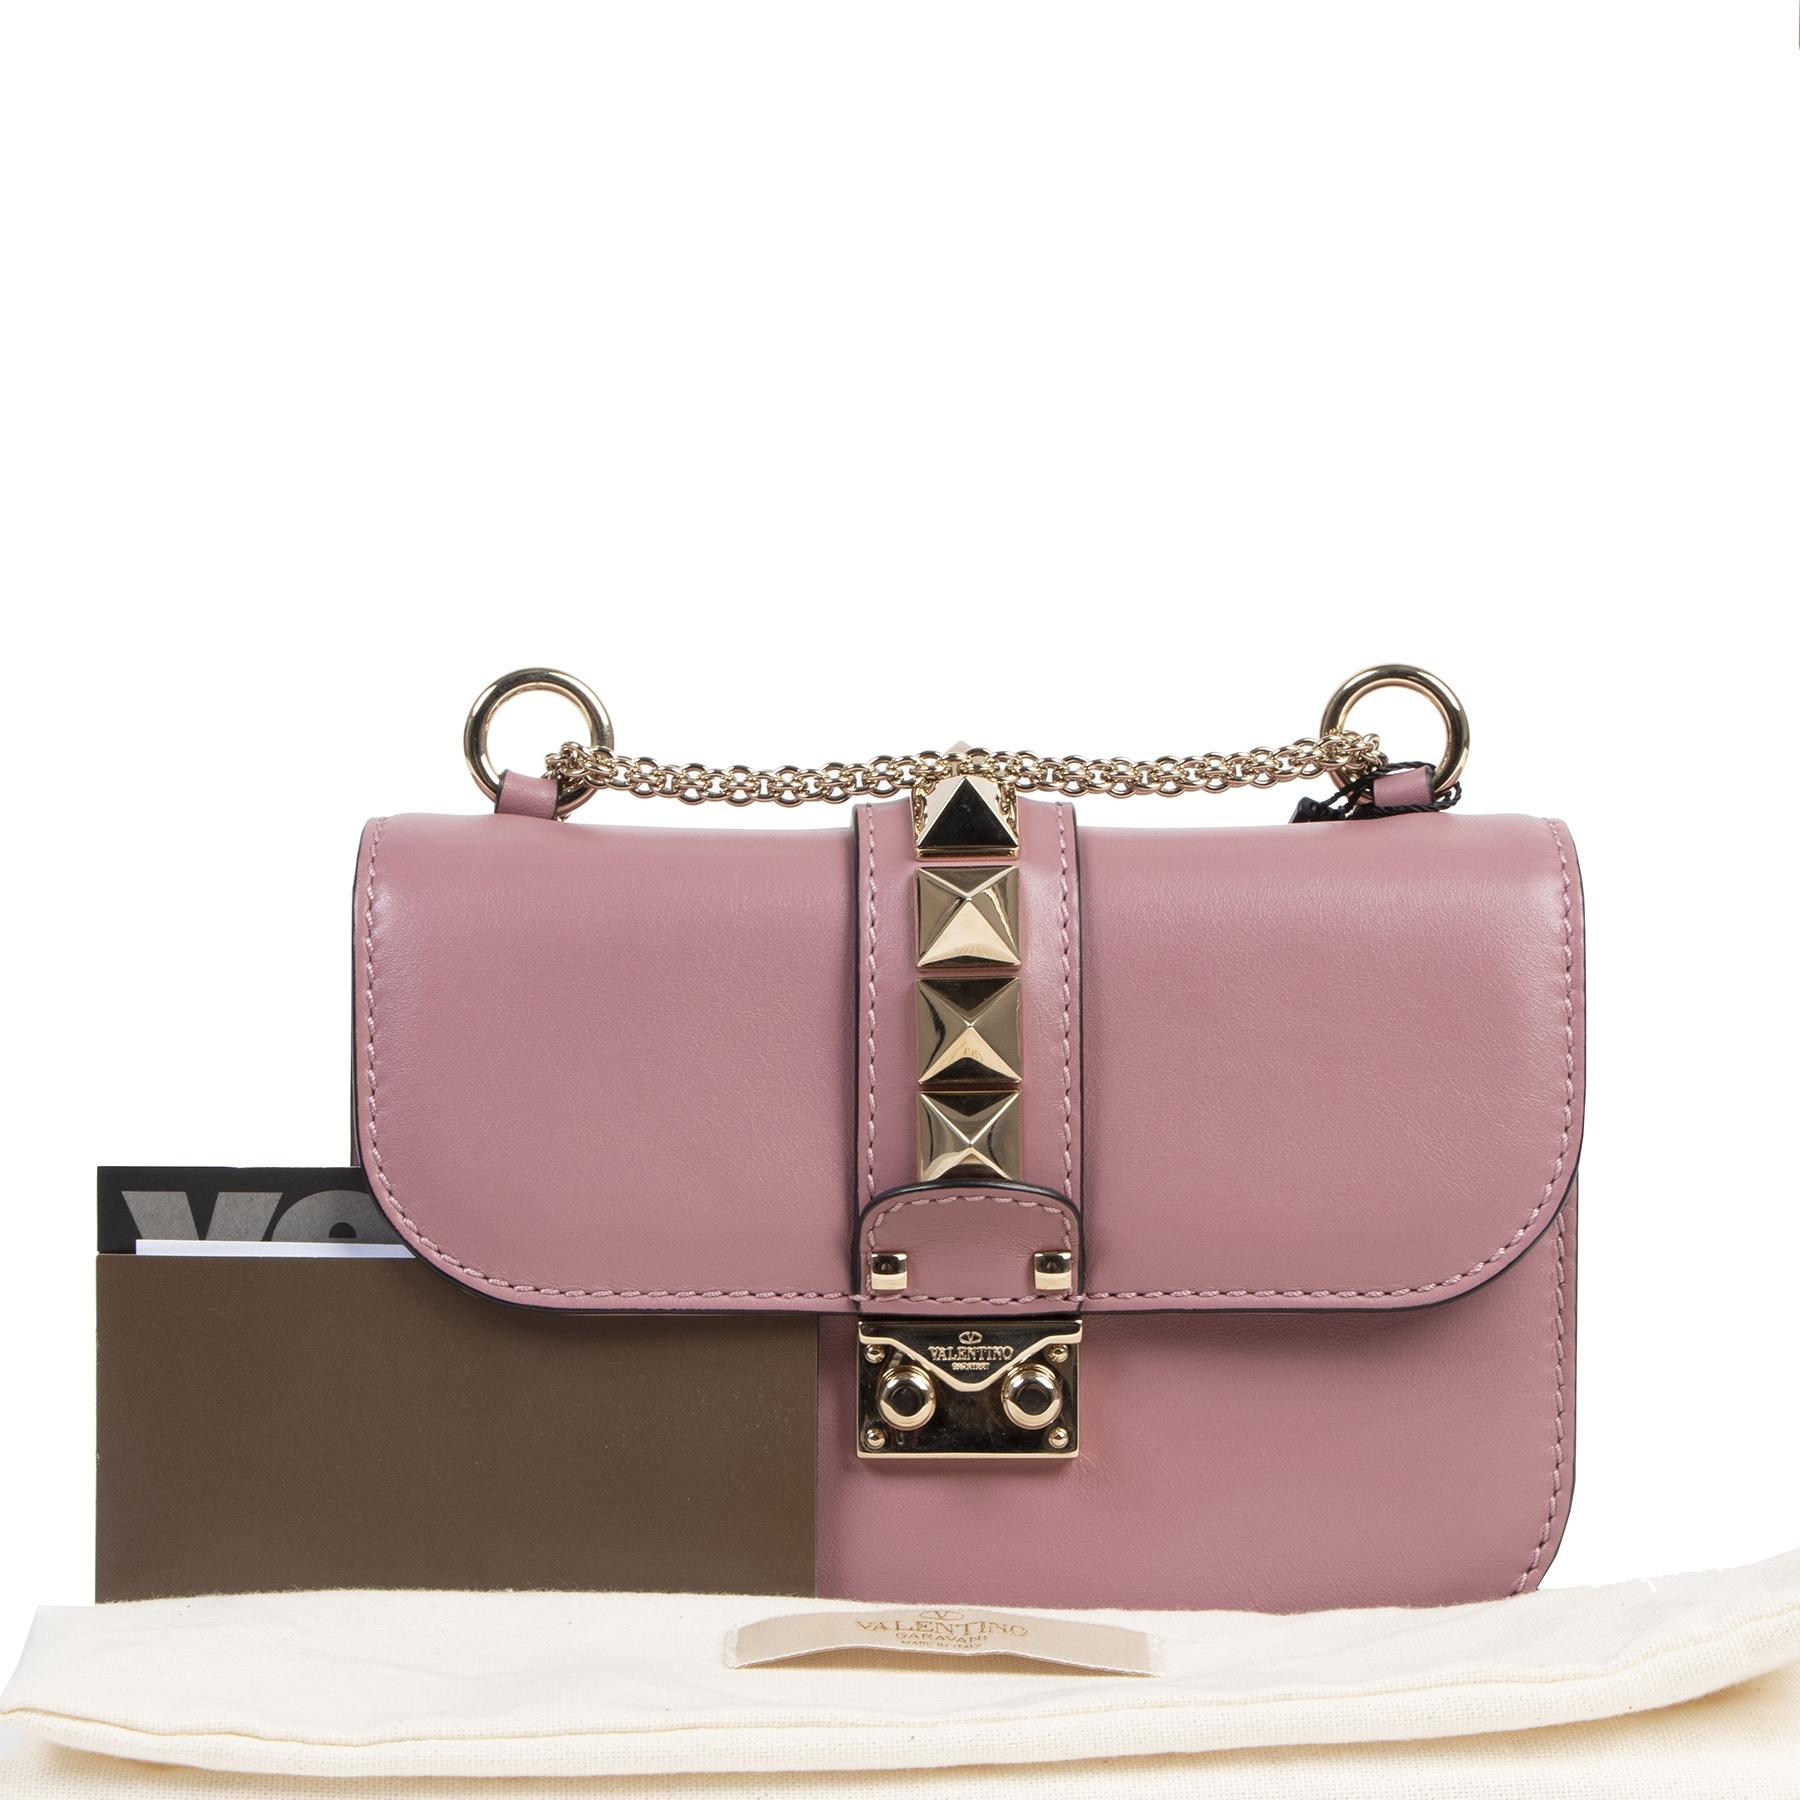 acheter en ligne seconde main Valentino Garavani Mini 'Glam Lock' Pink Purple Shoulder Bag